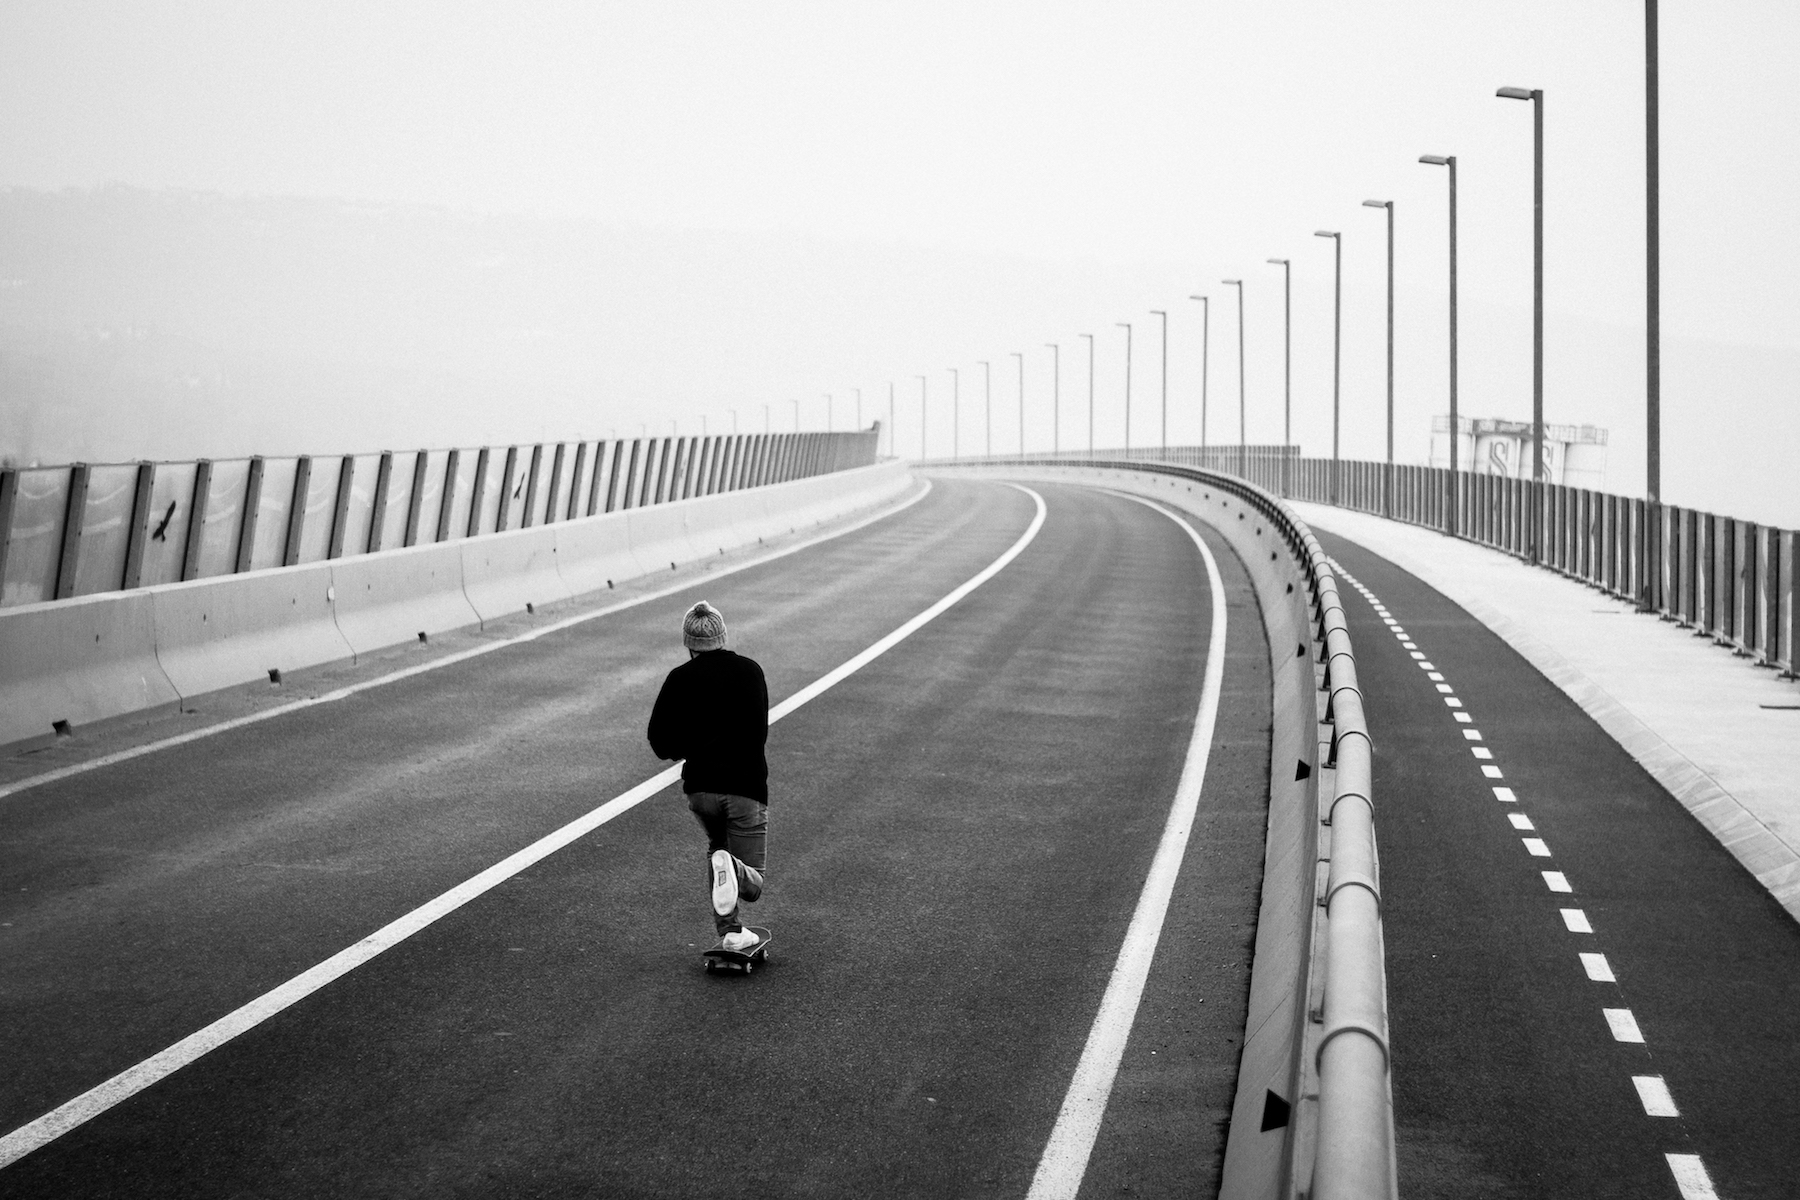 luke-paige-skate-photography-09